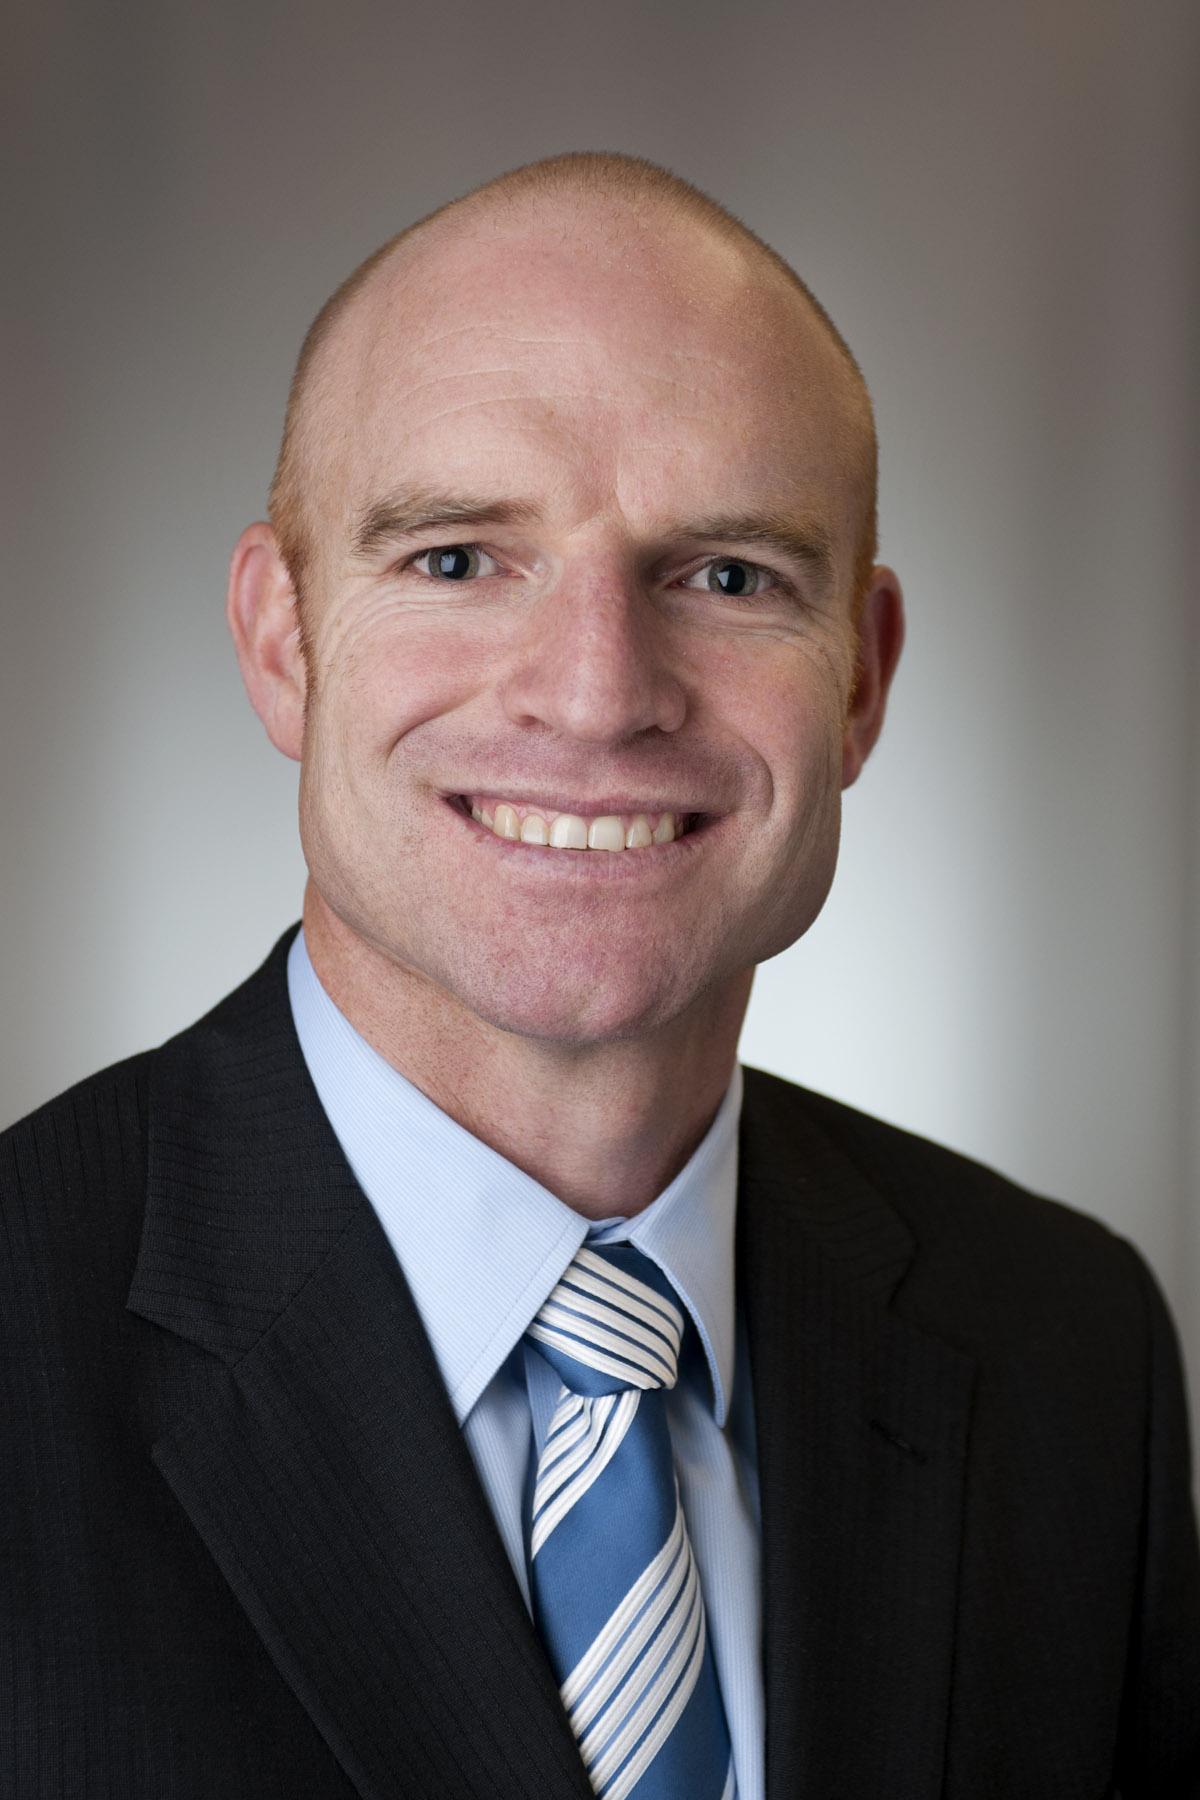 Greg Fisher, Lecturer